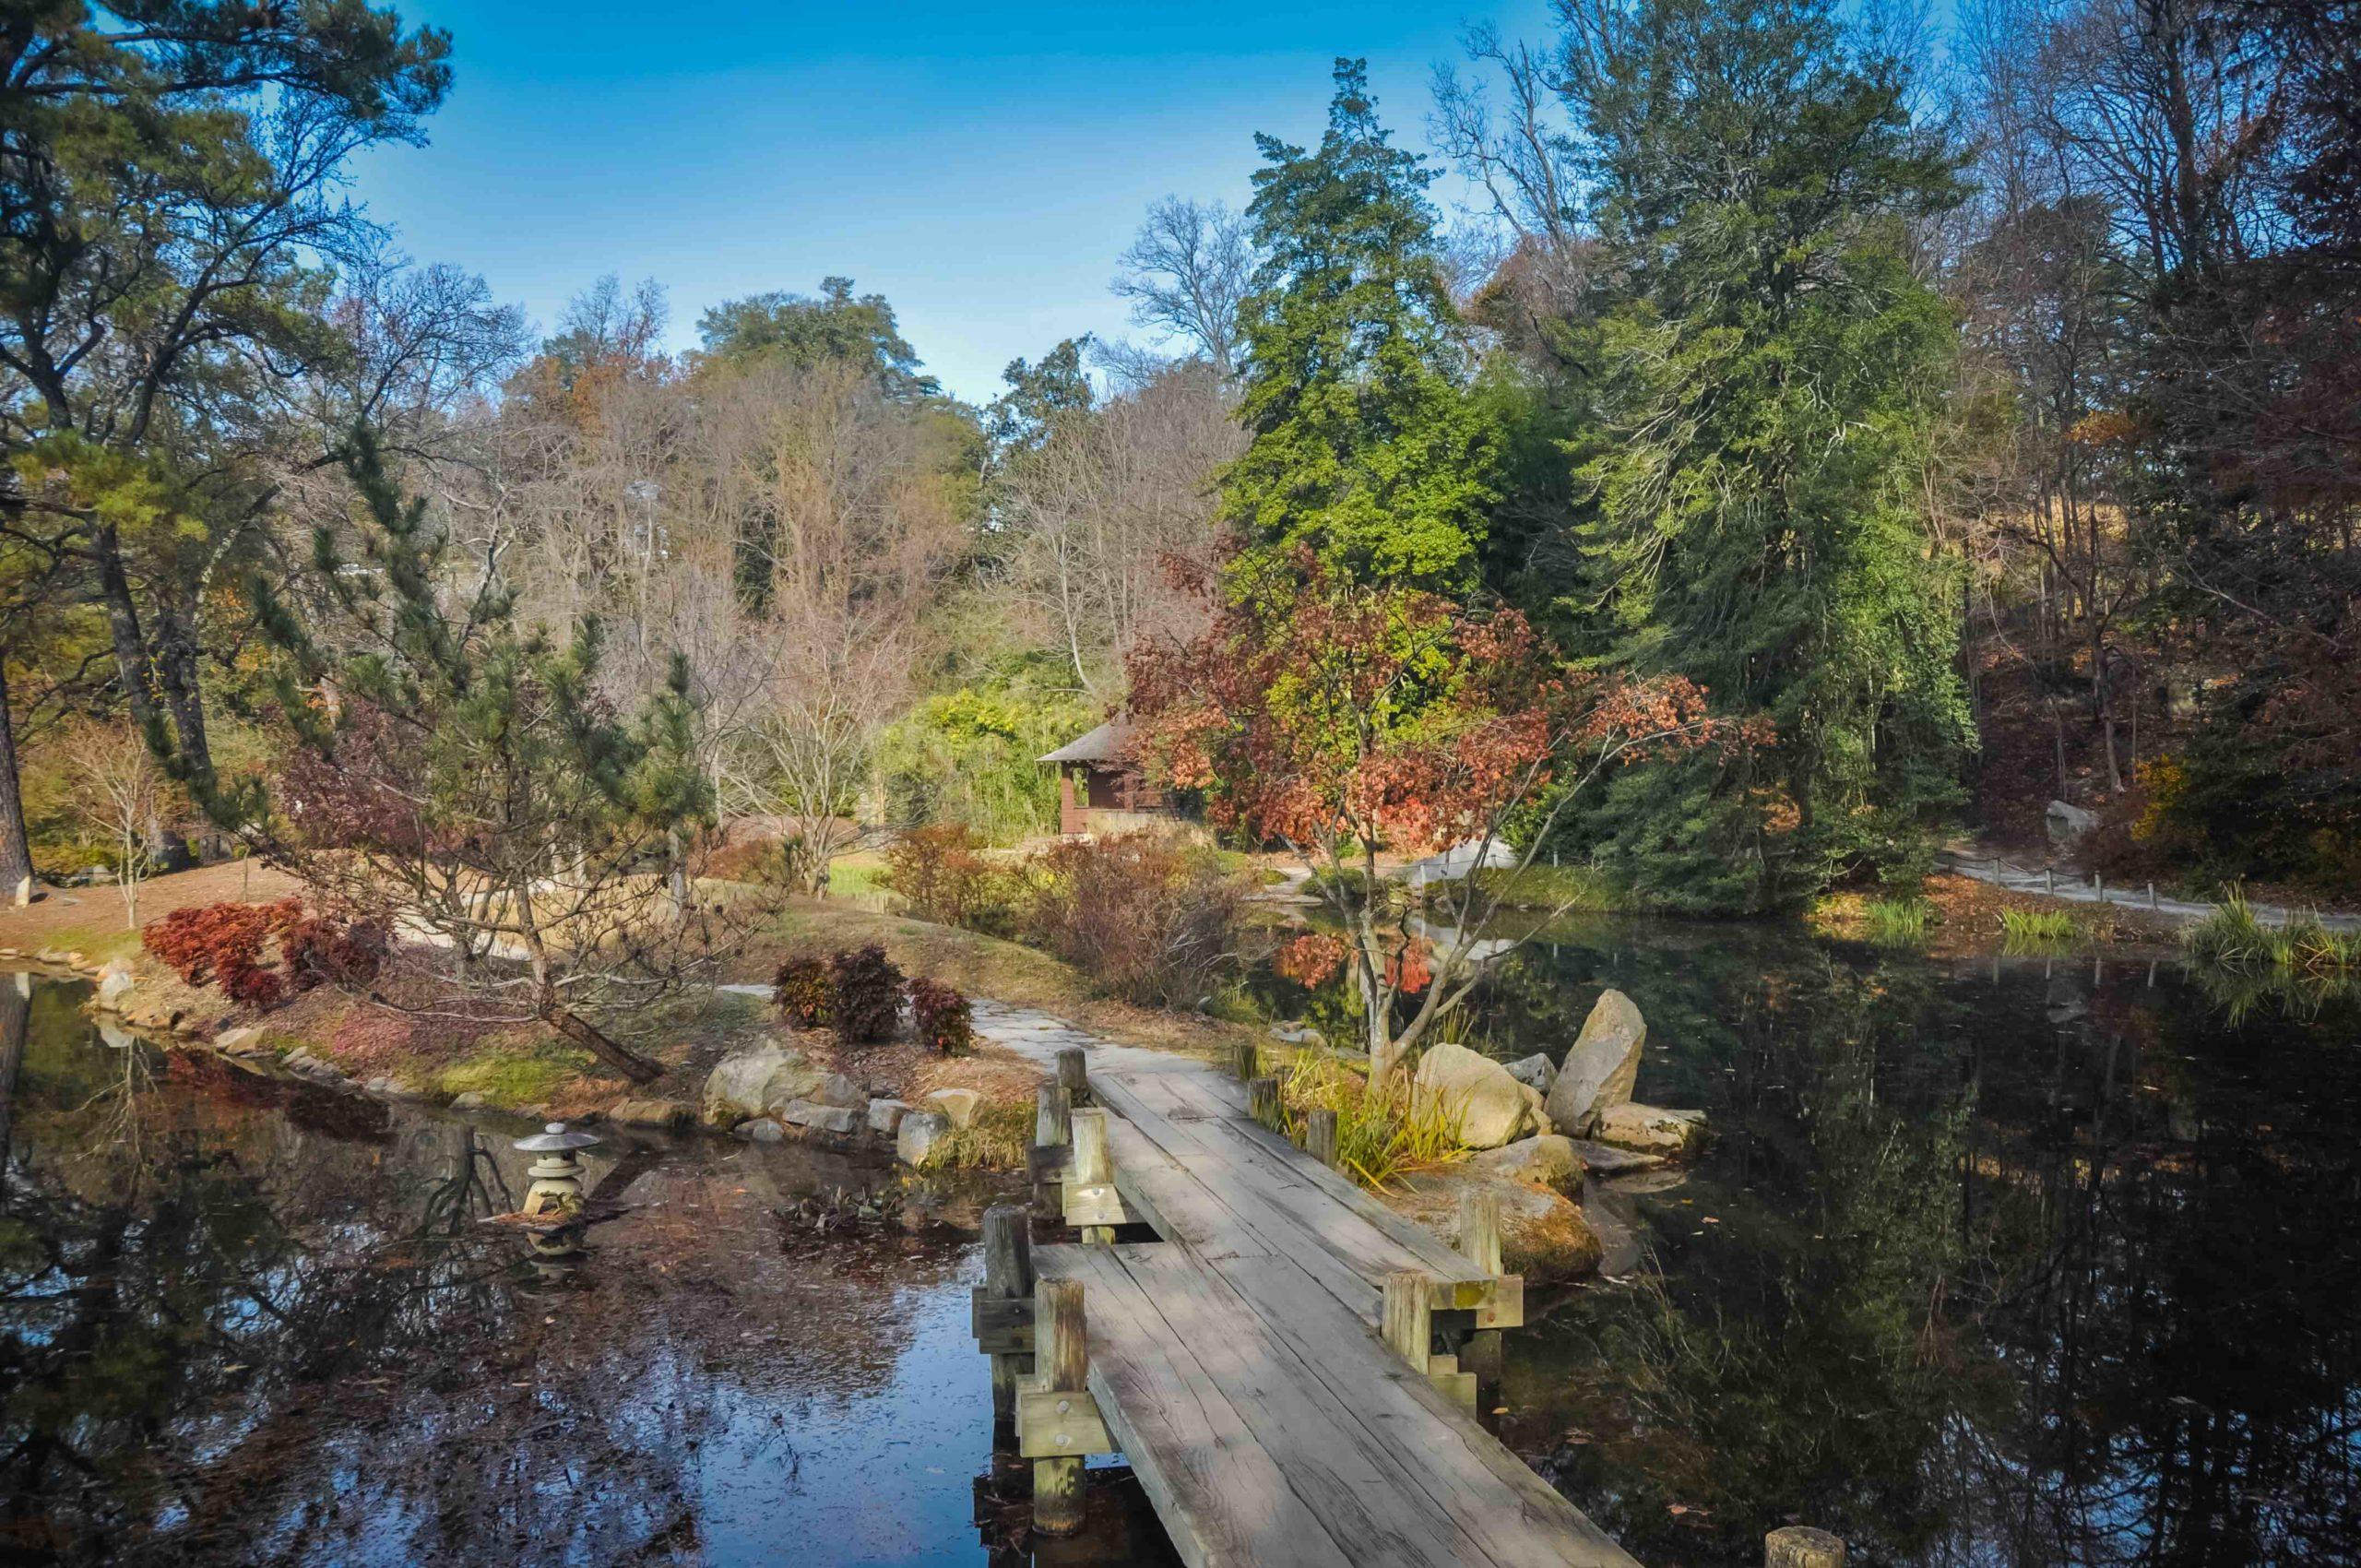 Gardens in Virginia